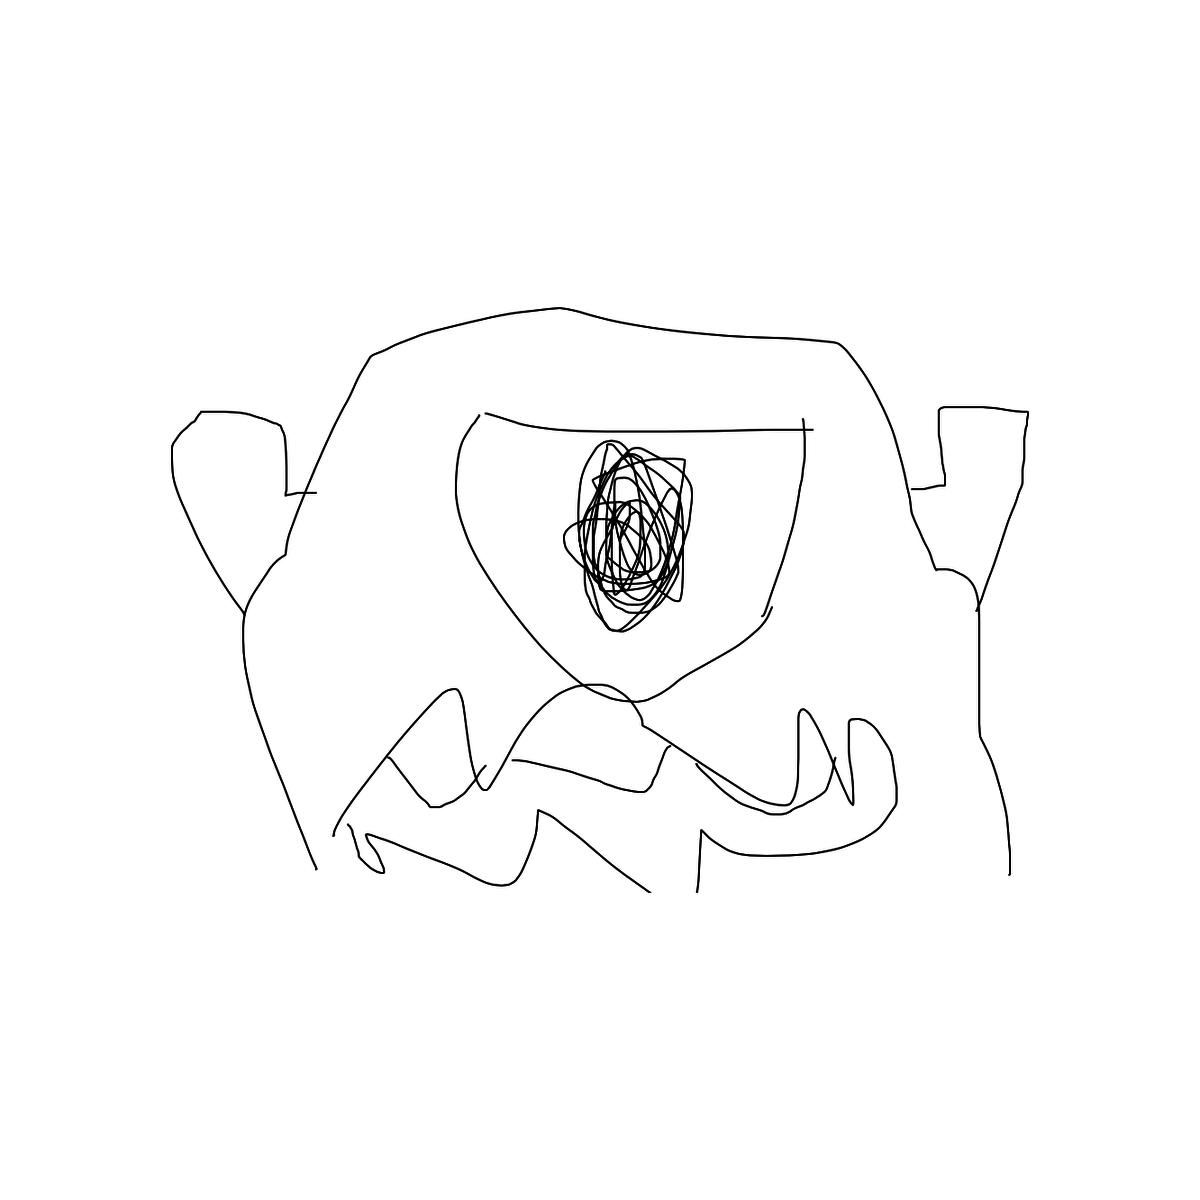 BAAAM drawing#284 lat:38.9860725402832000lng: -77.0978927612304700